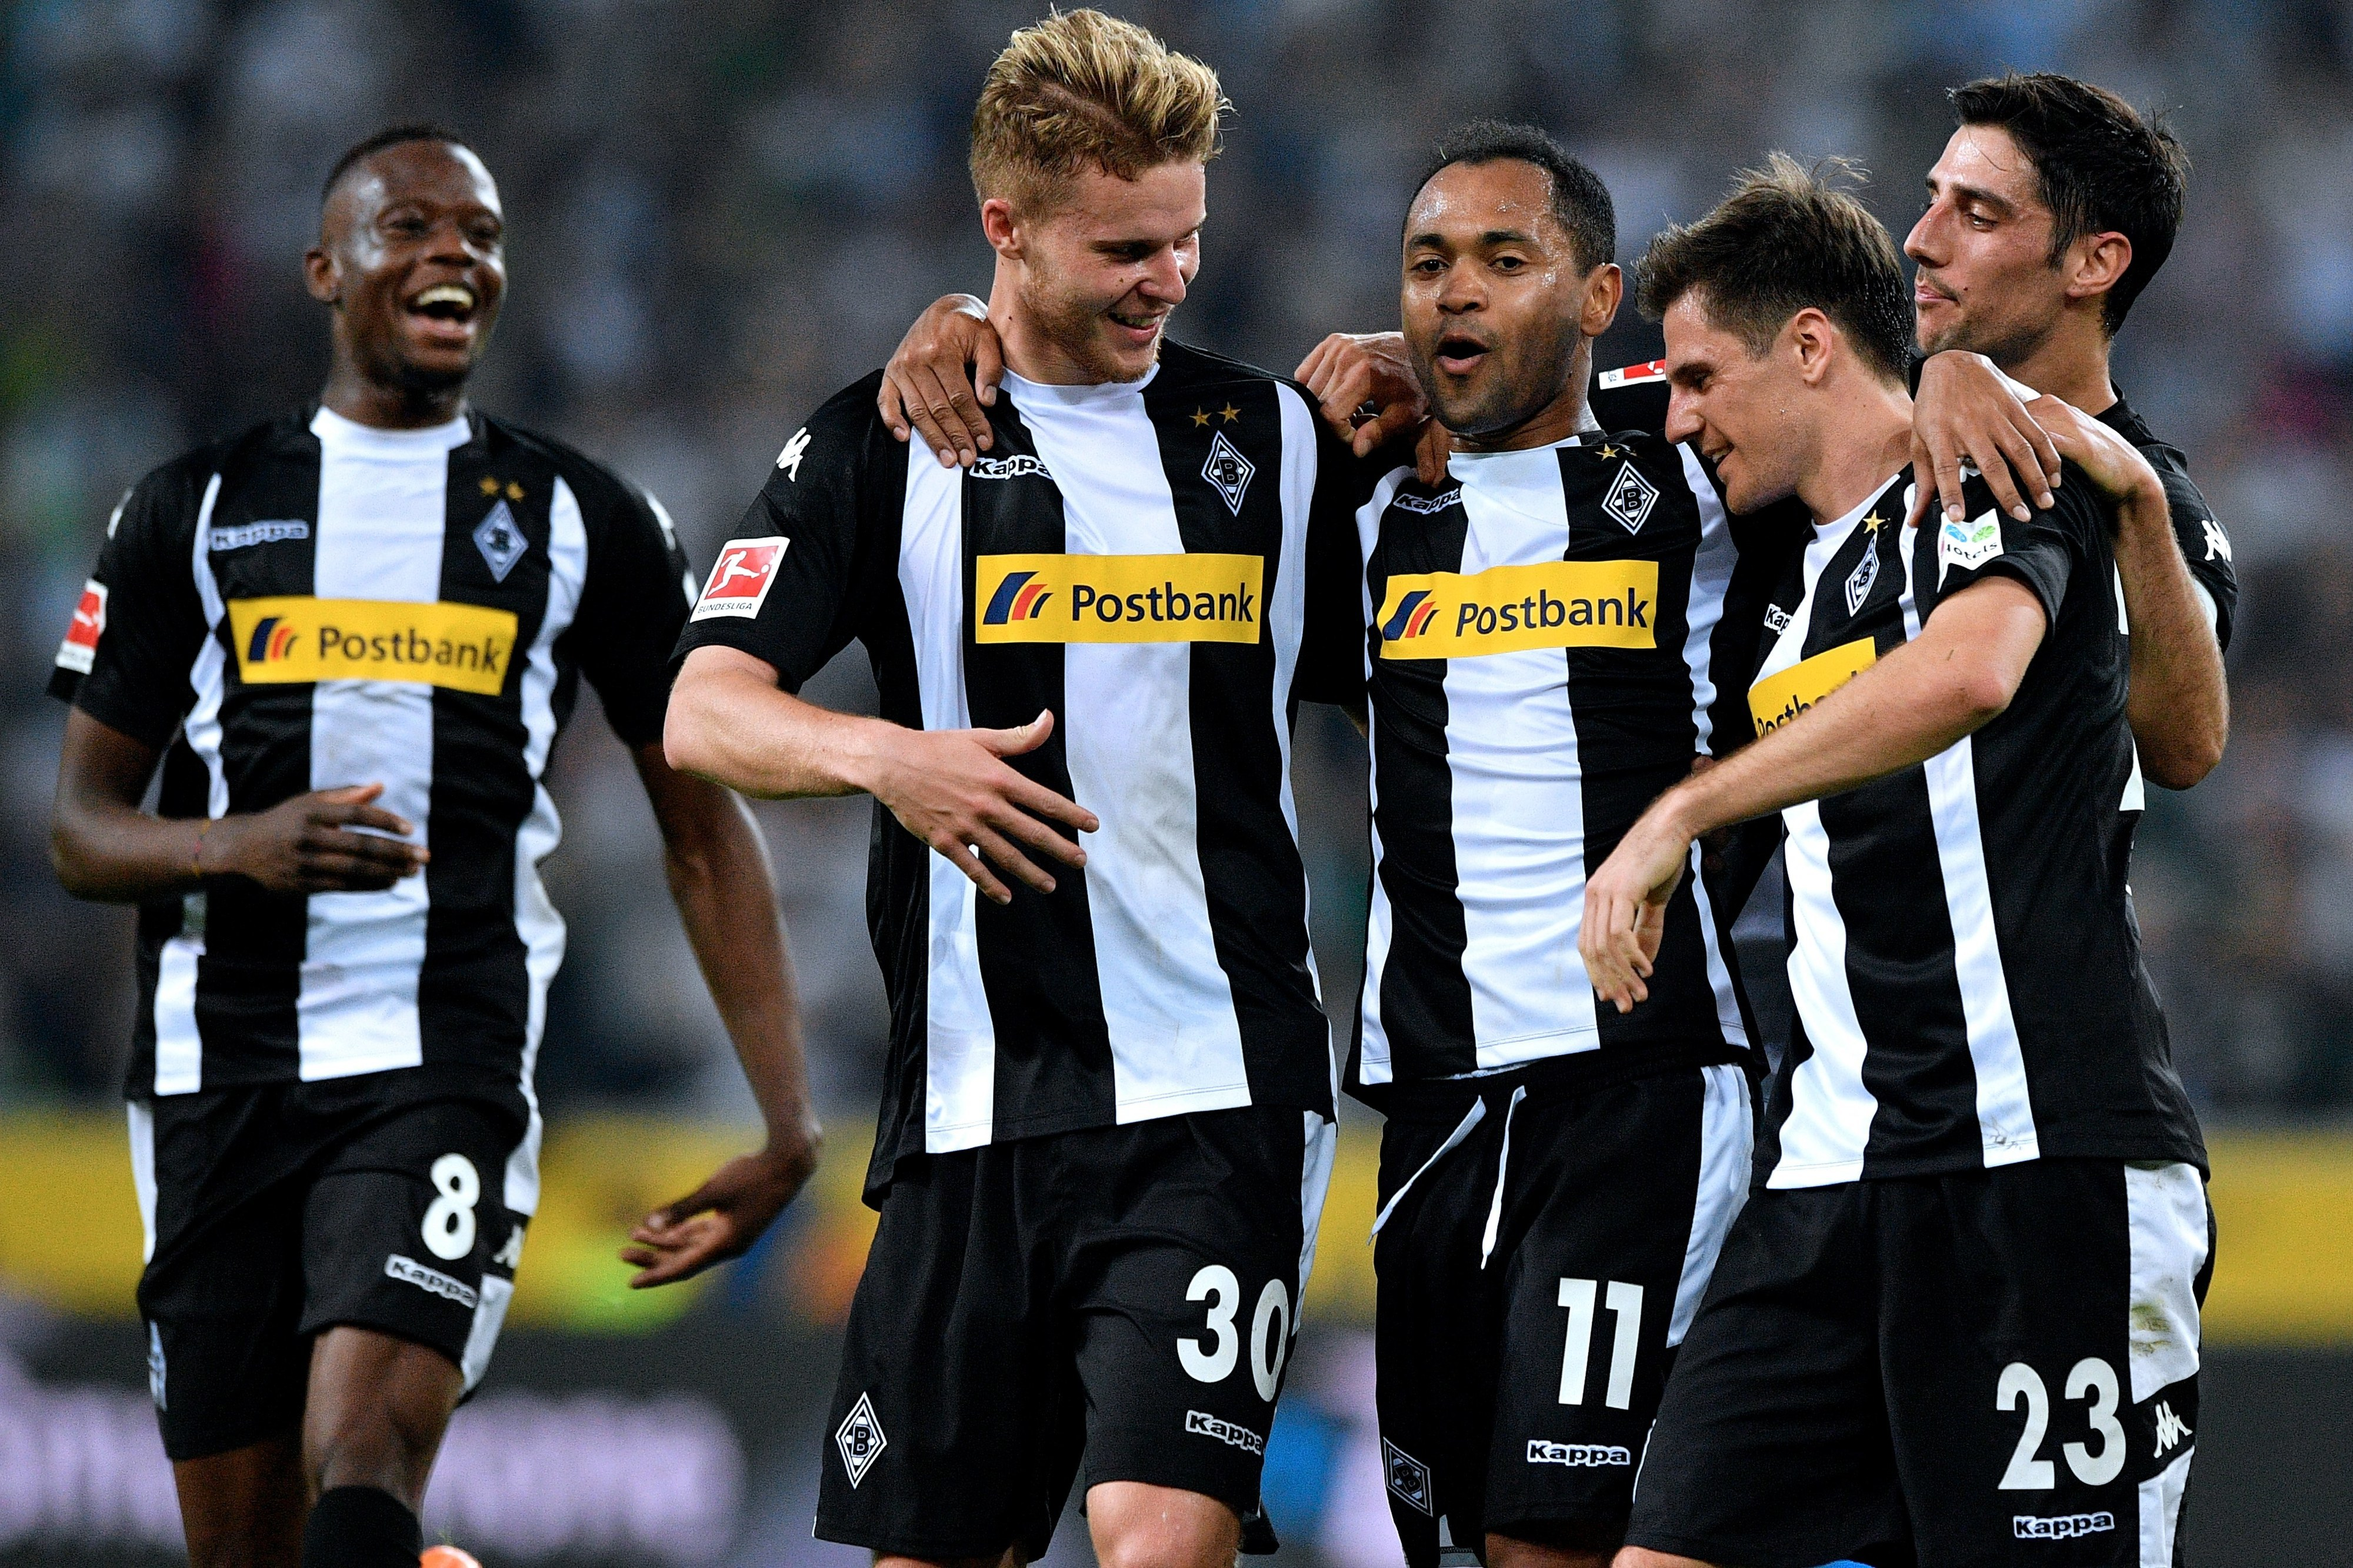 Moenchengladbach vence Wolfsburgo e mantém-se na luta pela Europa